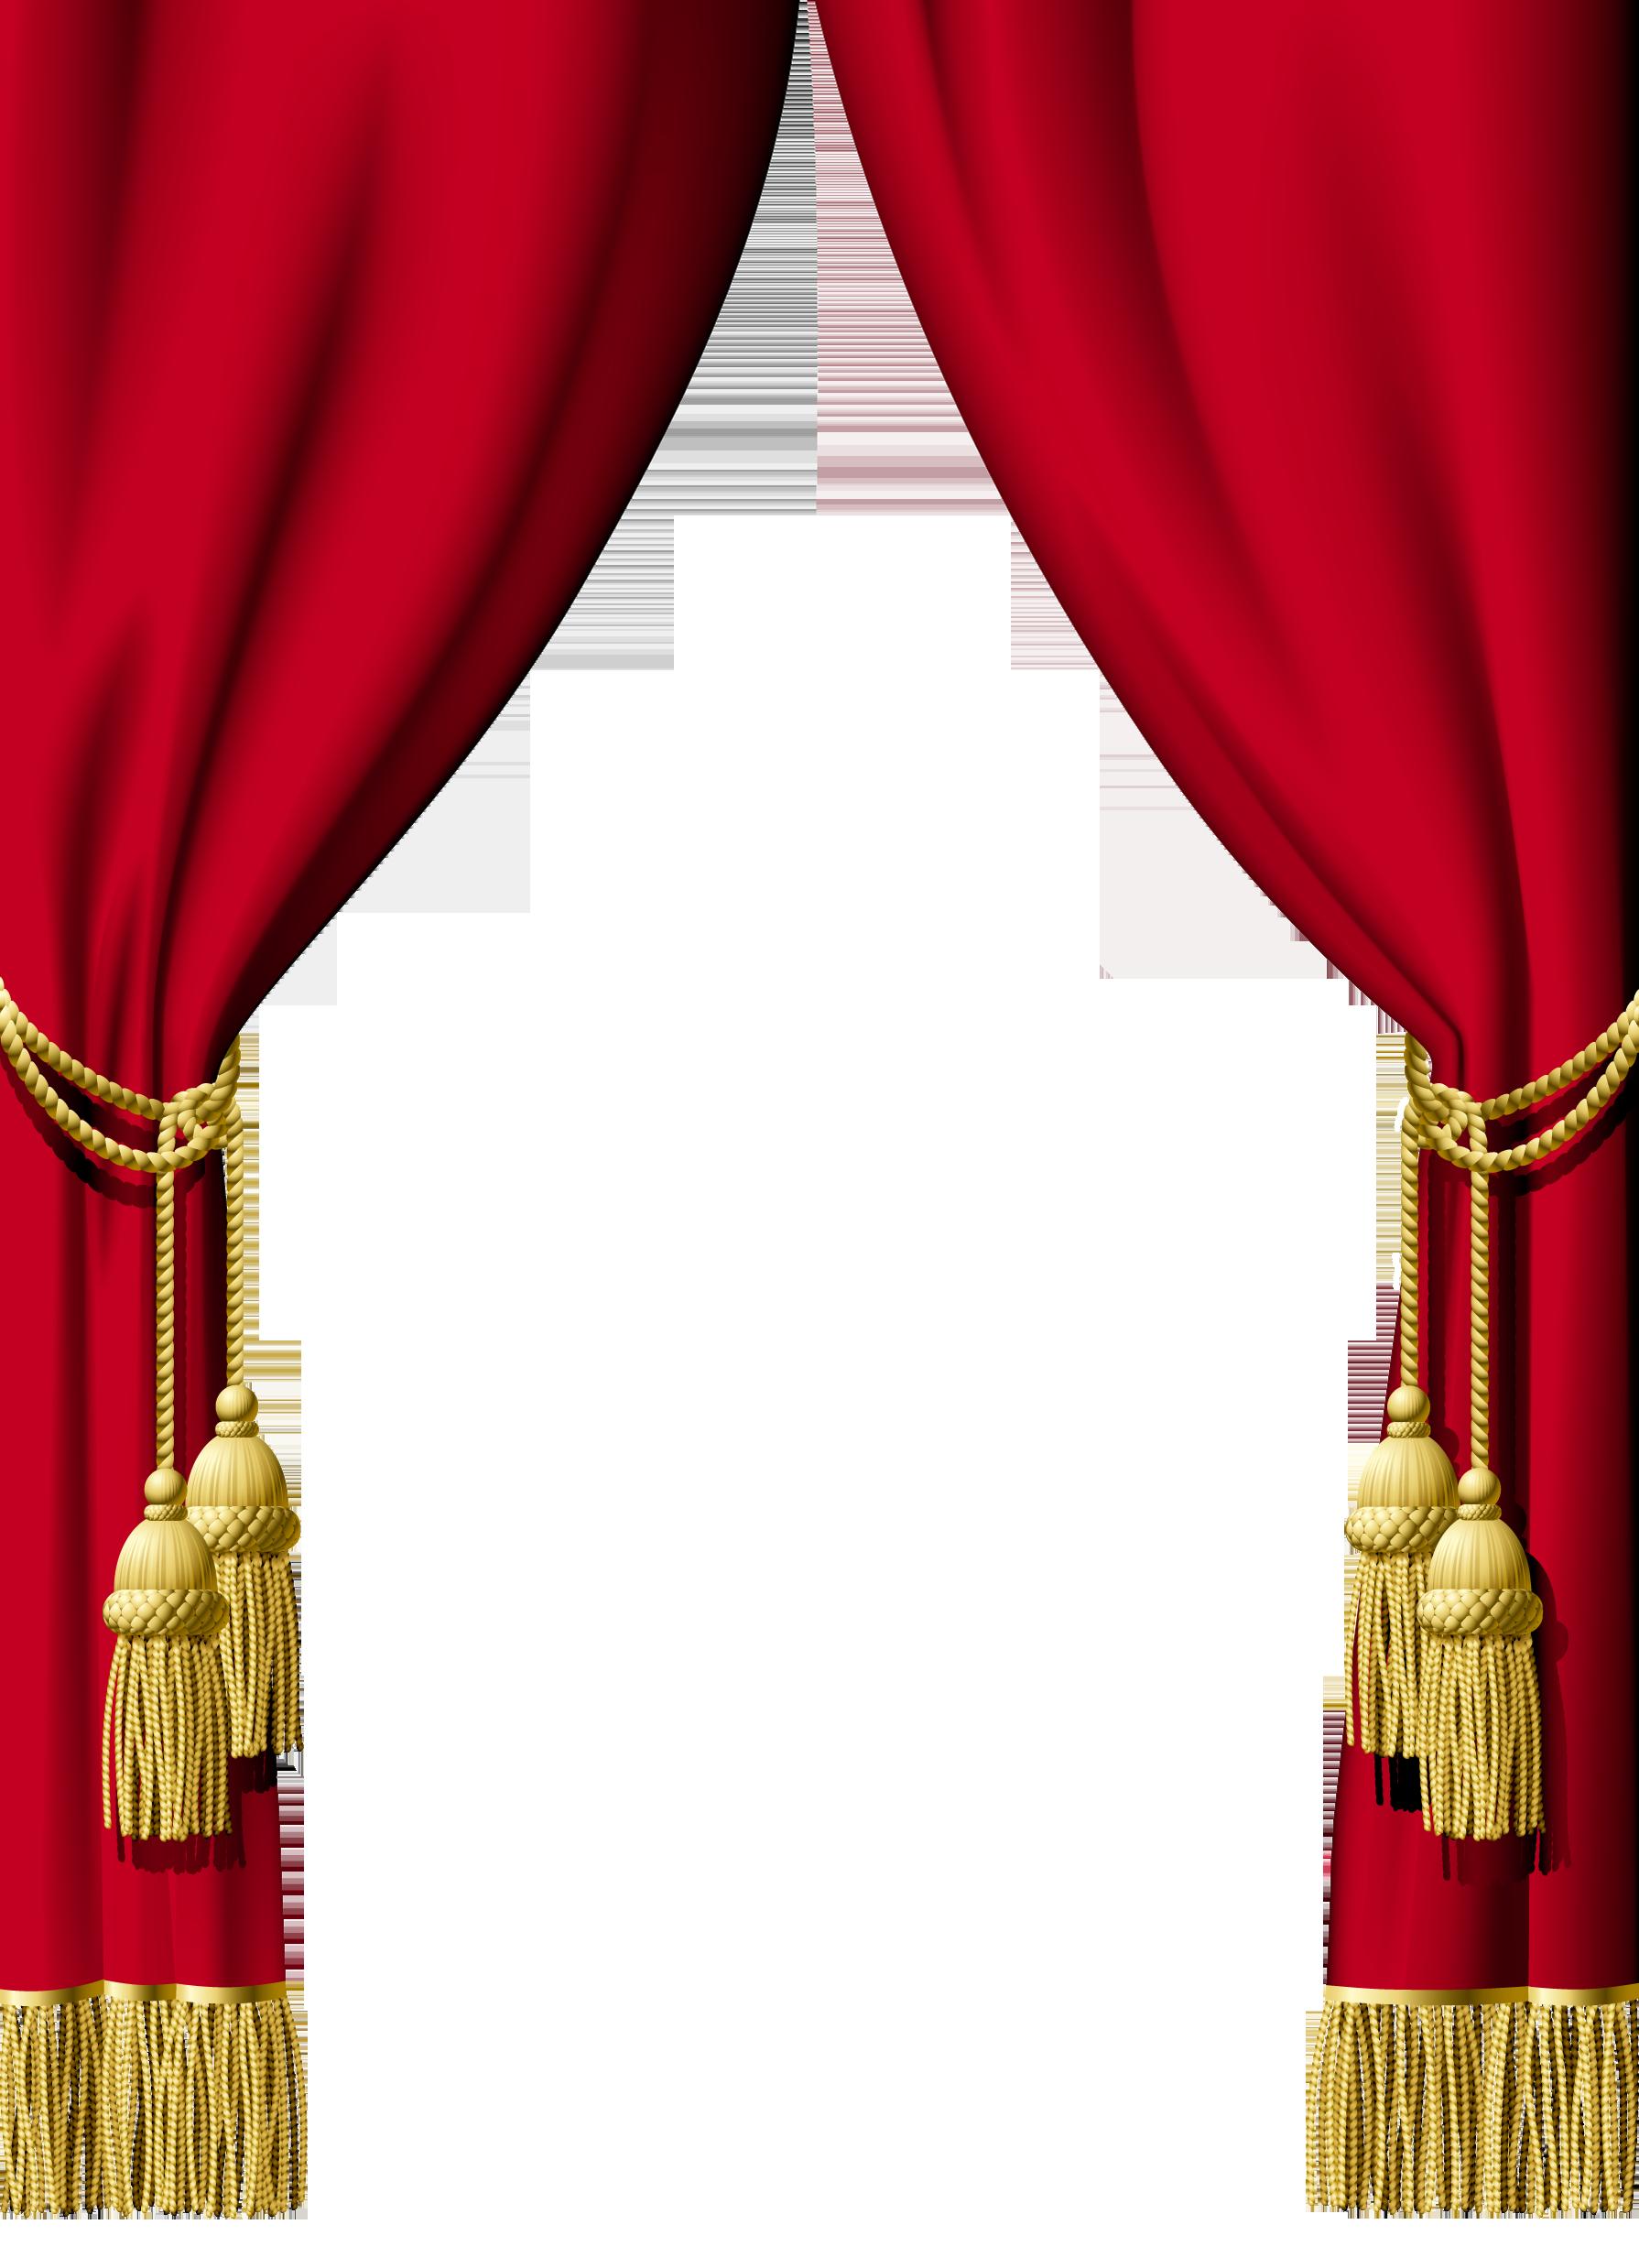 Curtain PNG Transparent Images.